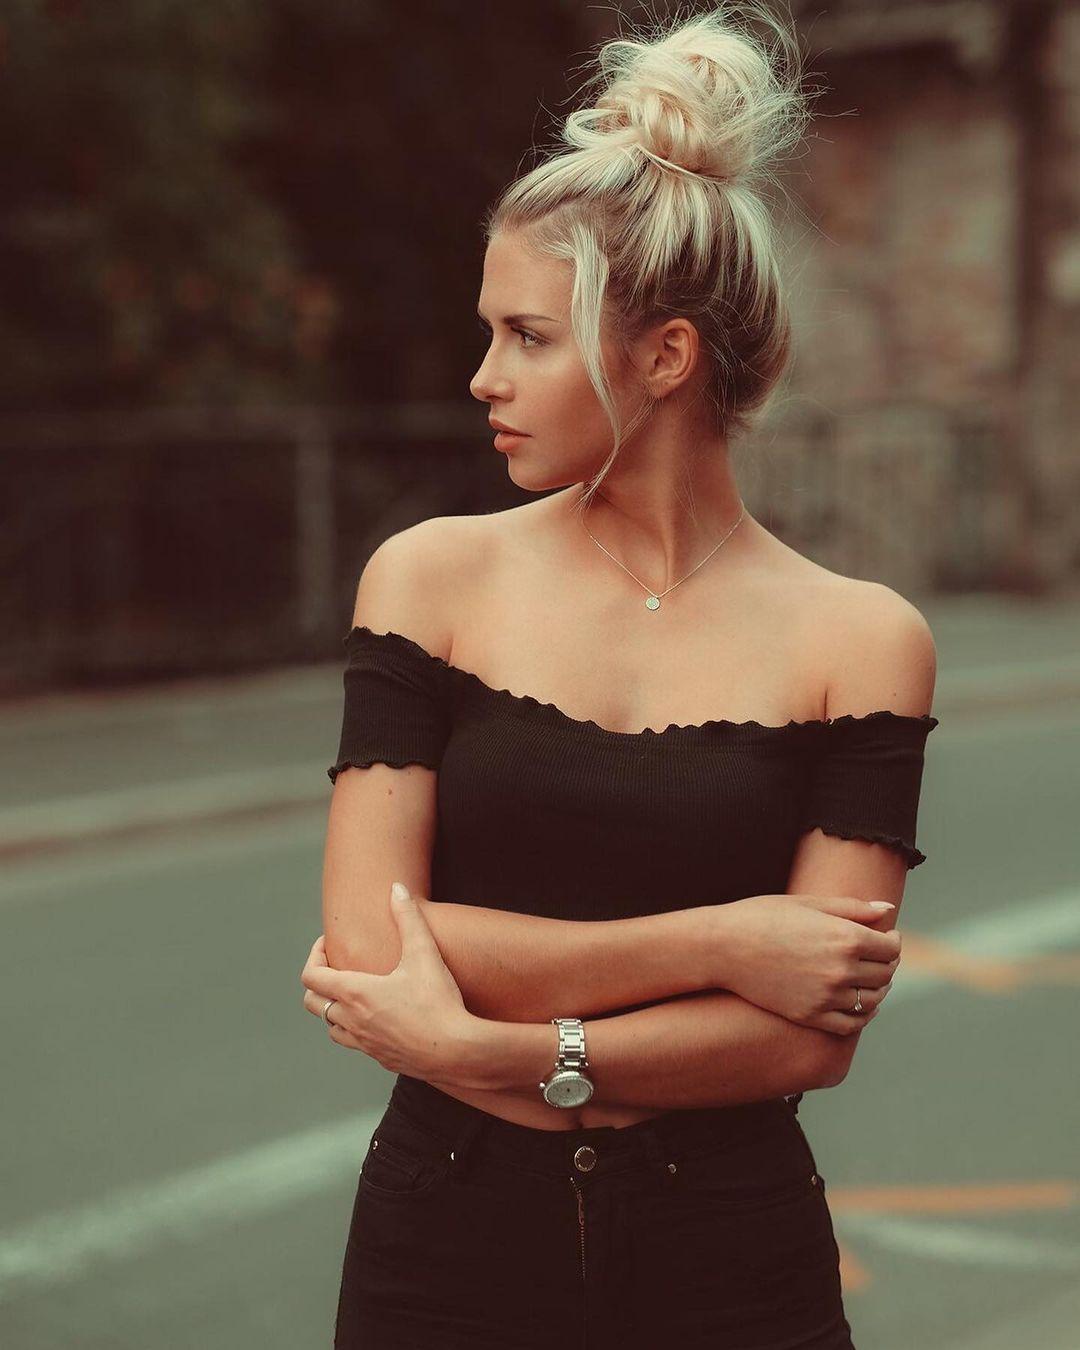 Maria-Luisa-Medack-Wallpapers-Insta-Fit-Bio-6